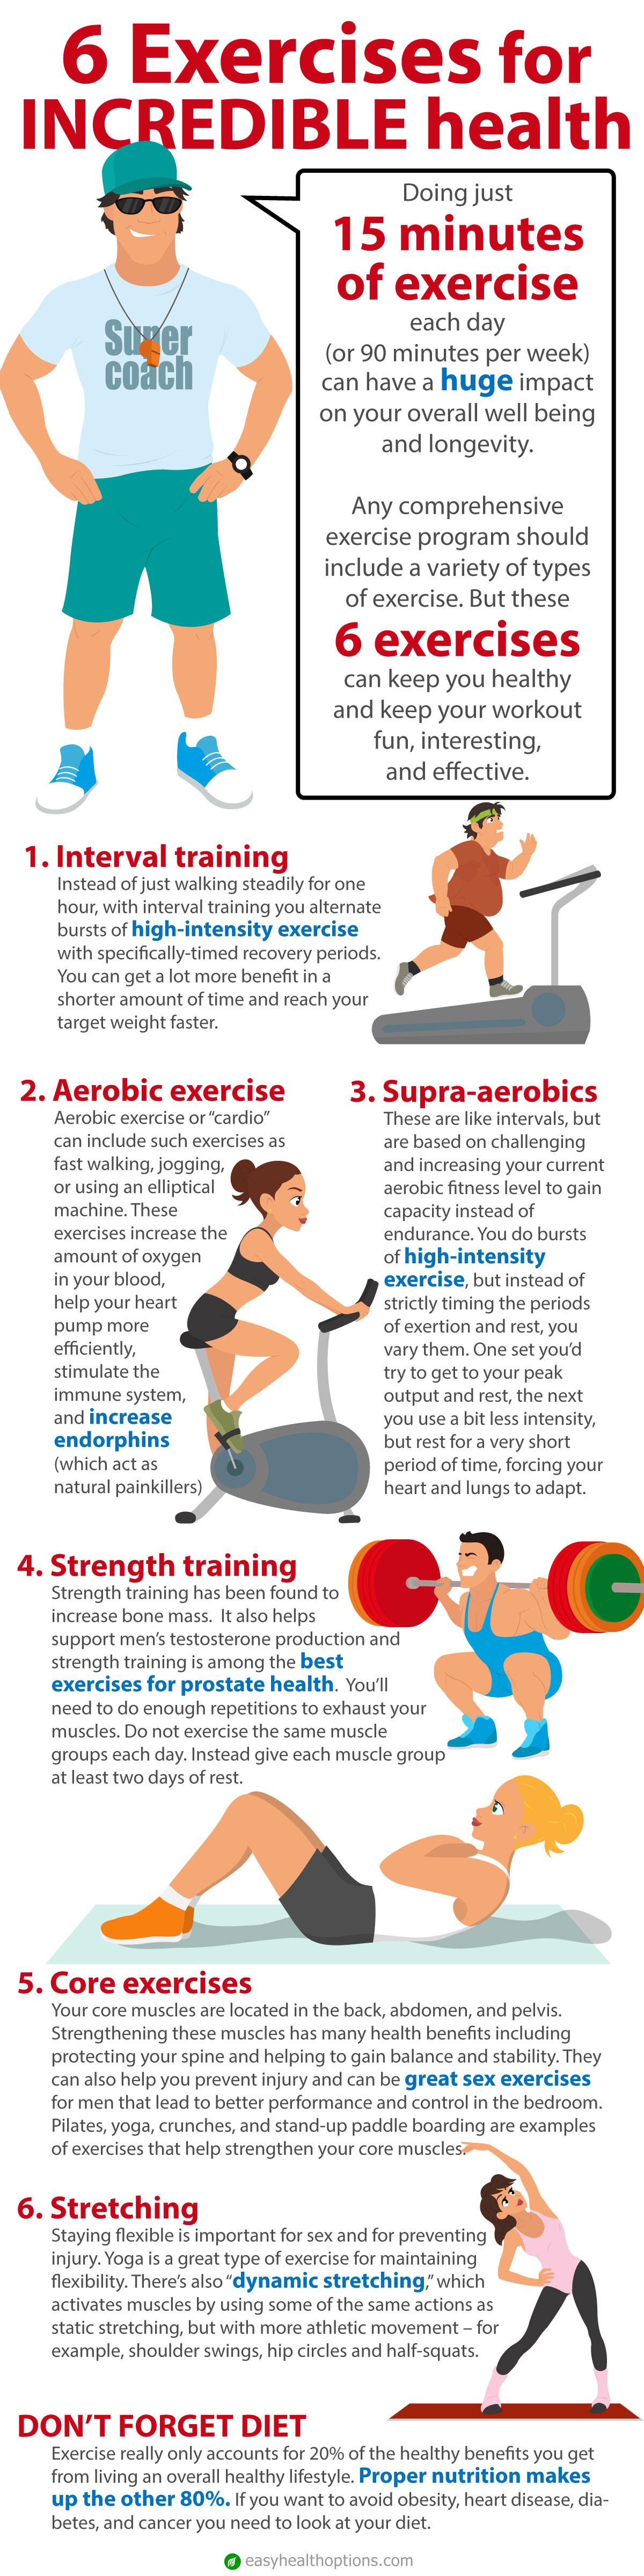 6-exercises-incrddible-health-2-PIN